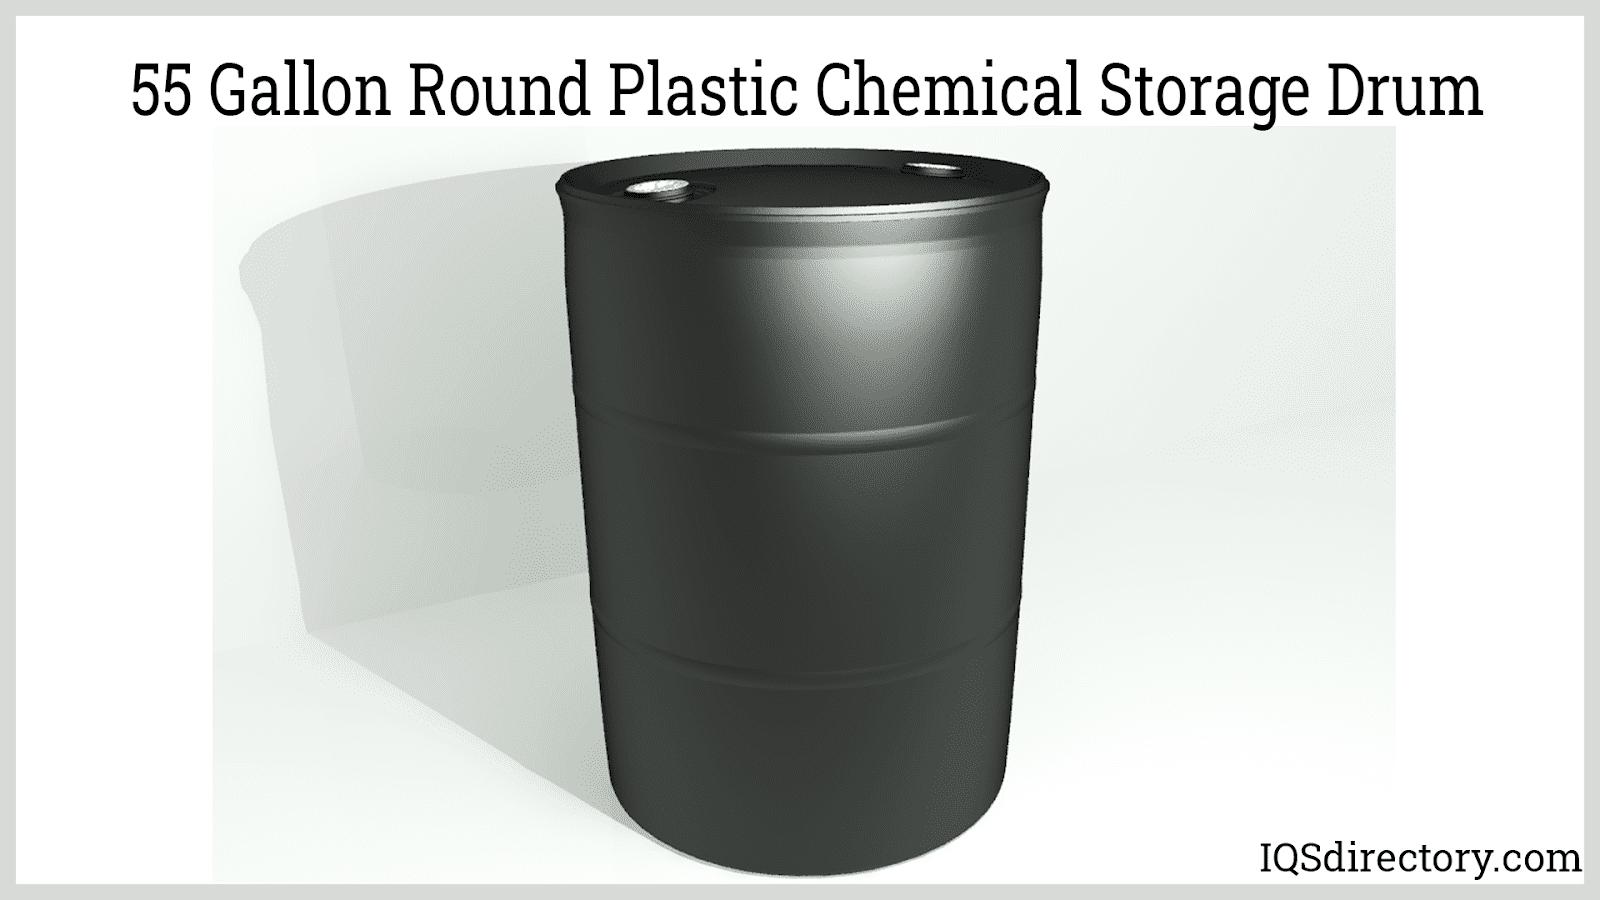 55 Gallon Round Plastic Chemical Storage Drum